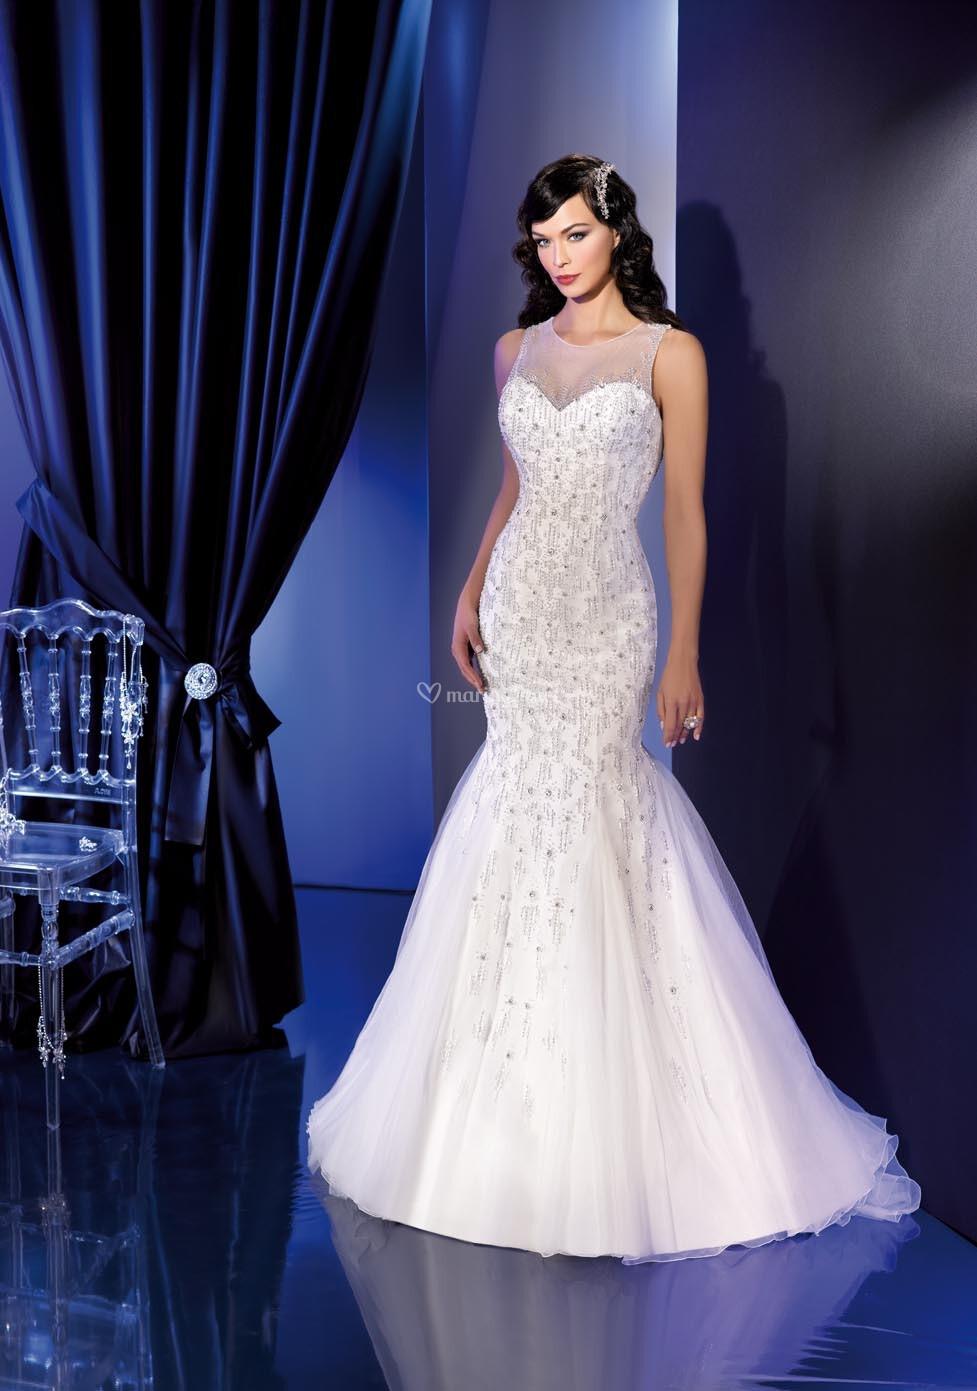 Robes de mari e sur kelly 39 s ks 166 01 for Boutiques de robe de mariage kansas city